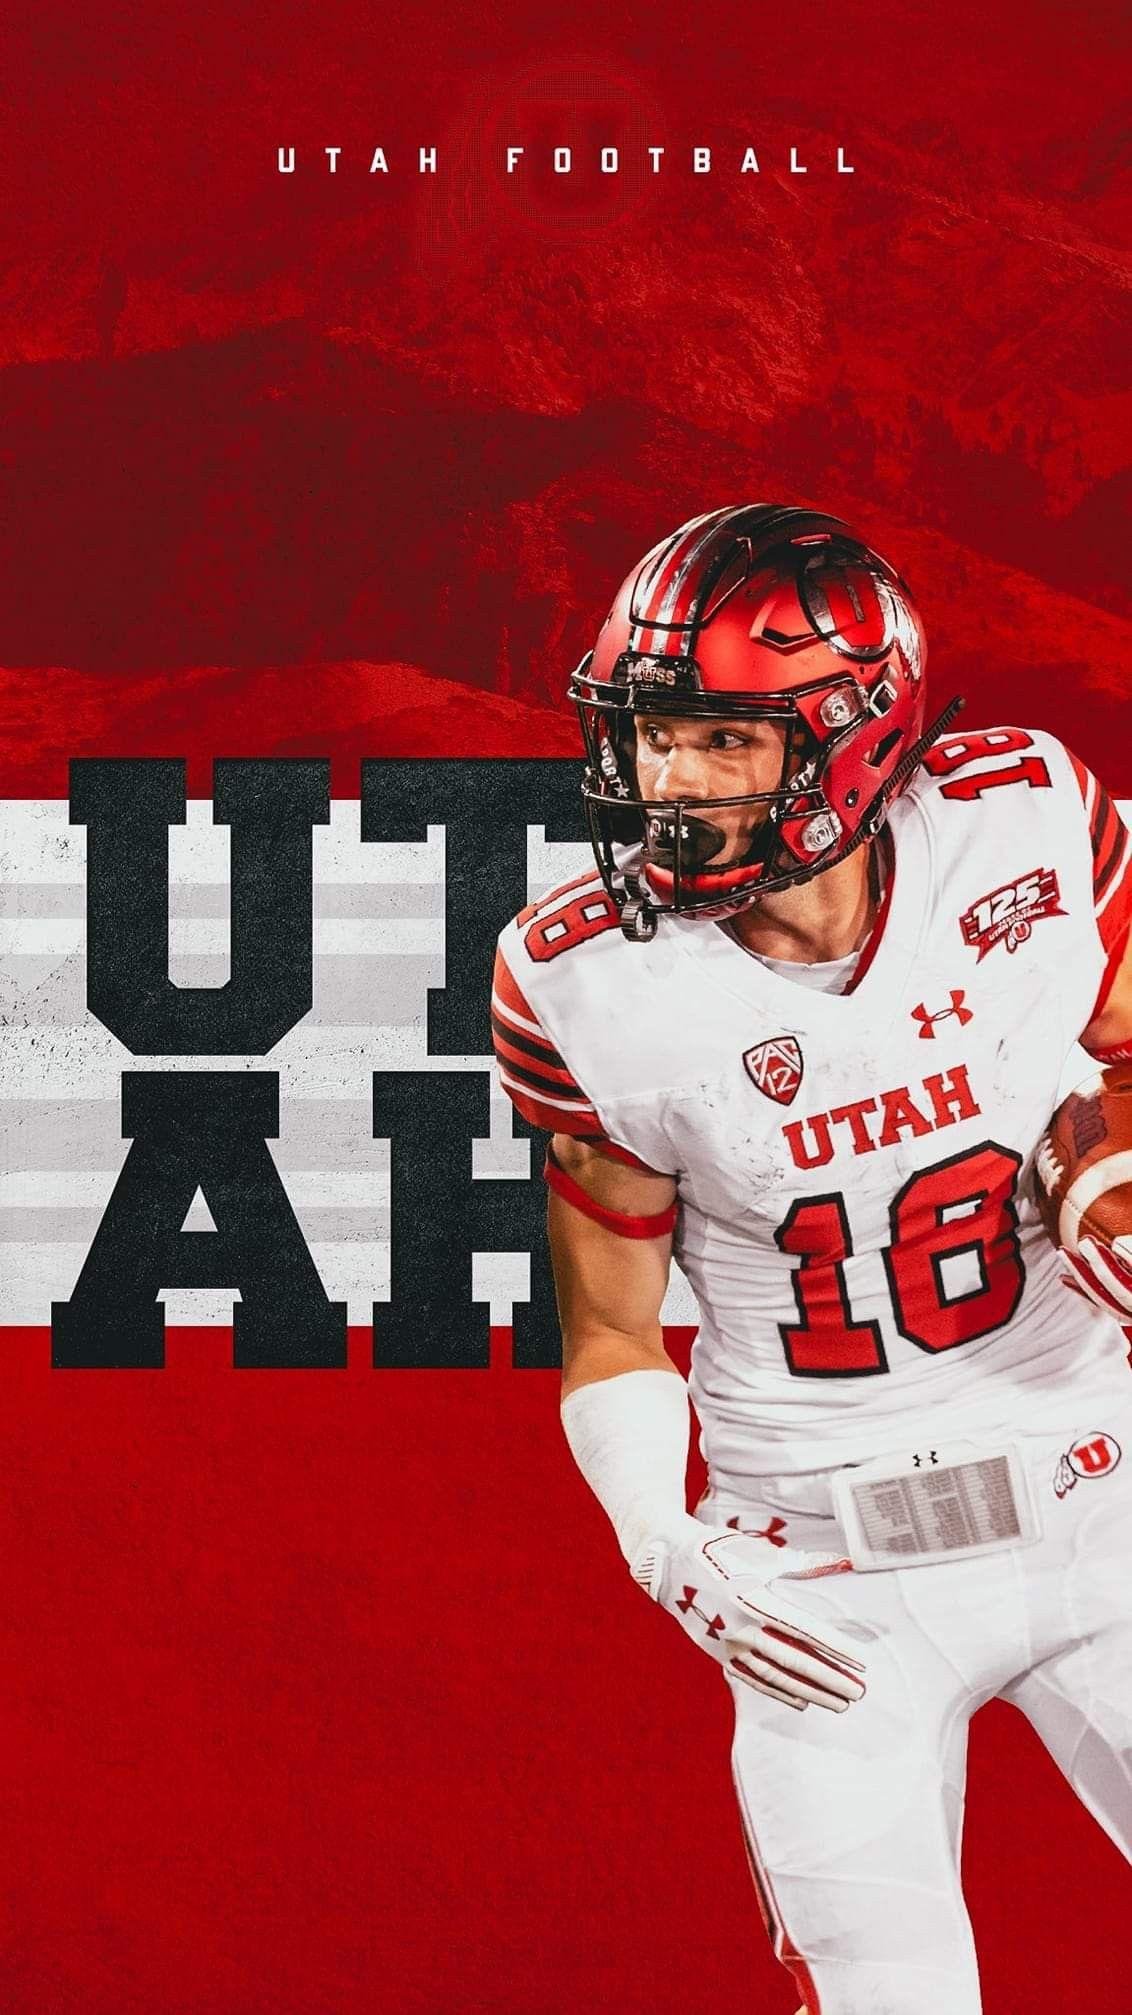 Pin By Utah Redzone On Football Utah Utes Football Utes Football Utah Football